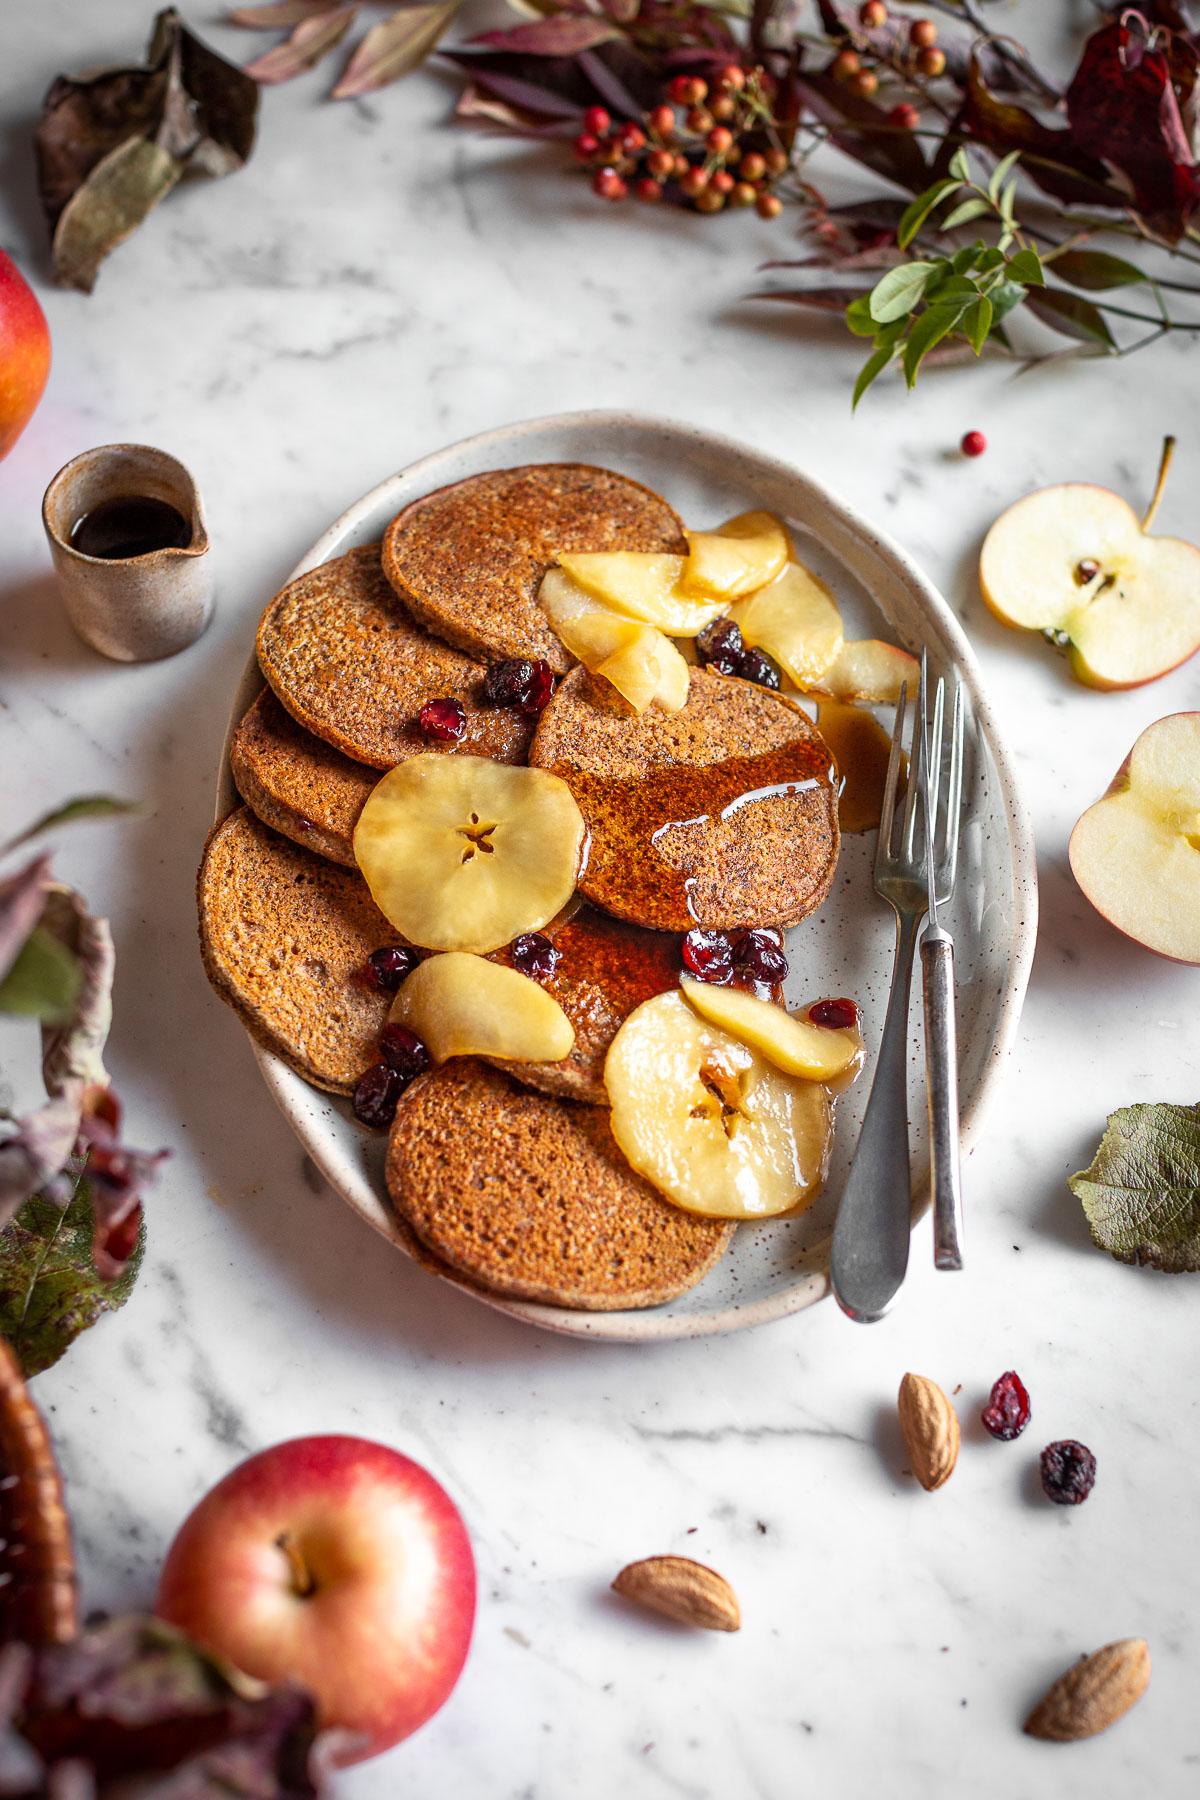 ricetta PANCAKES VEGAN di GRANO SARACENO e MELE SENZA GLUTINE SENZA ZUCCHERO con mele caramellate e datteri gluten-free VEGAN APPLE BUCKWHEAT PANCAKES with caramelized apples recipe